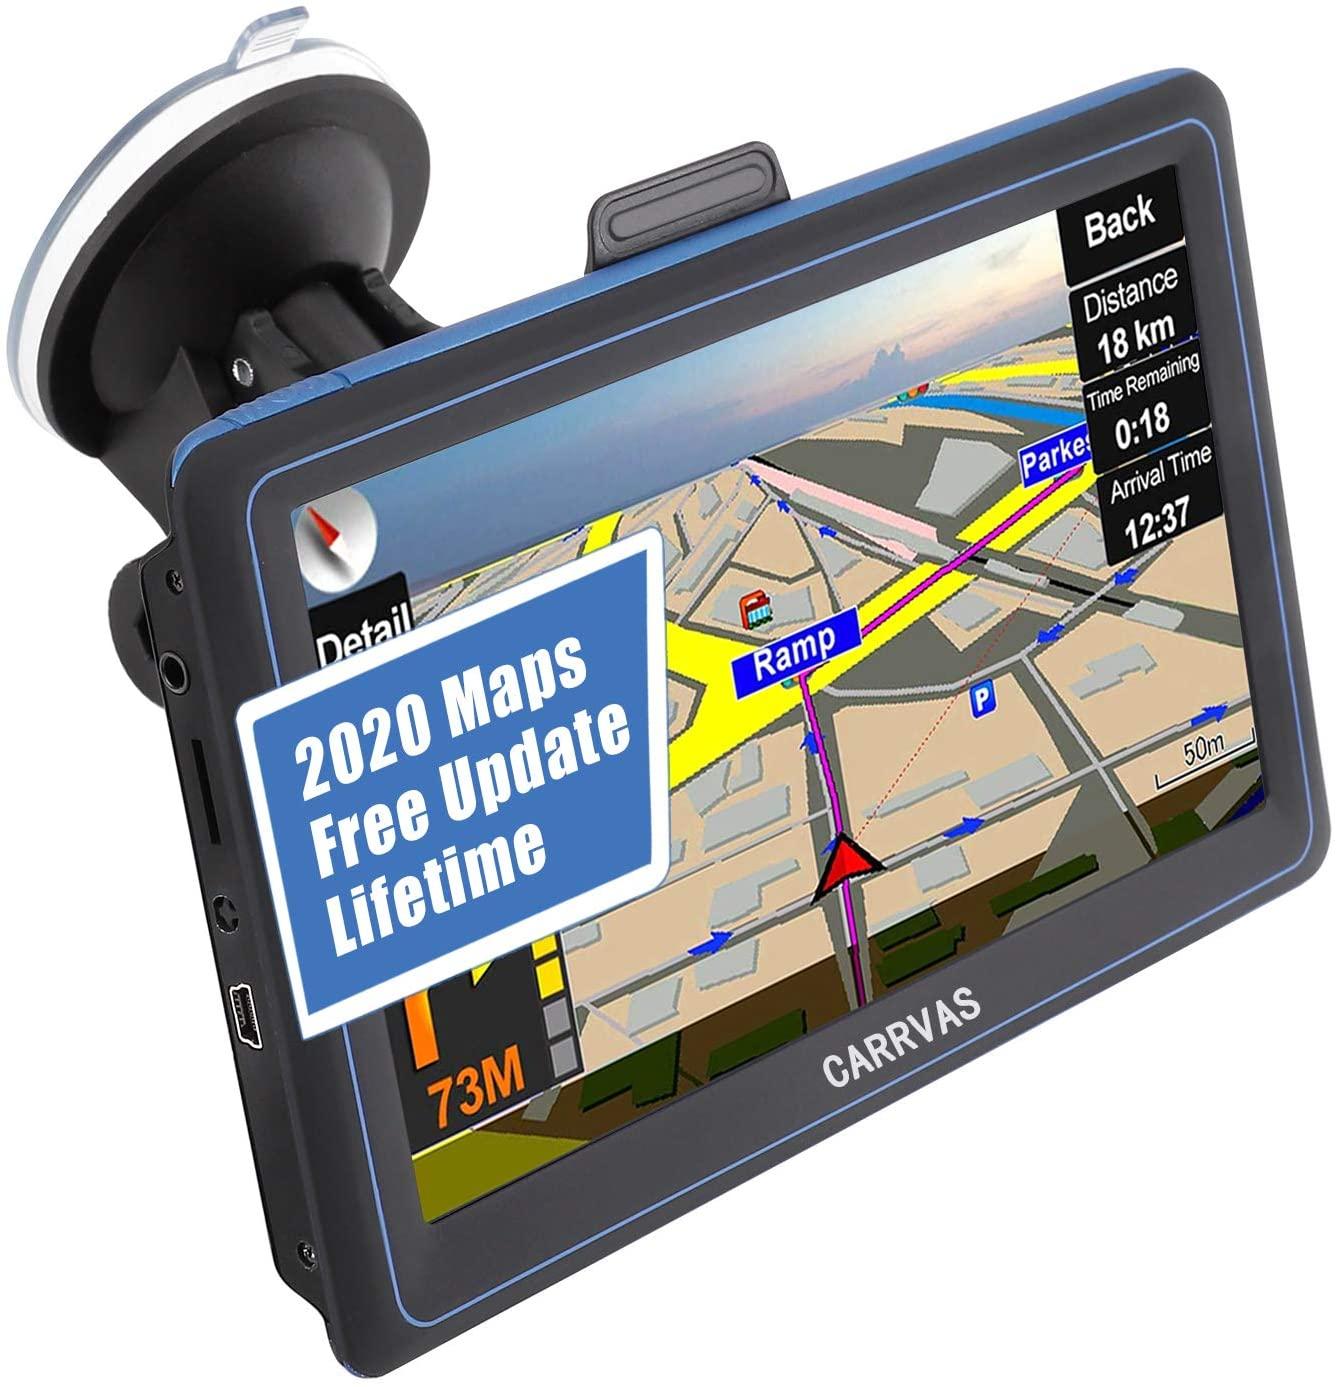 GPS Navigation for Car & RV & Truck, CARRVAS - 7 inch Satellite Navigation, North America, Central America, Free Lifetime Map Update, Speed Alert, Voice Turn Indication GPS Navigation System